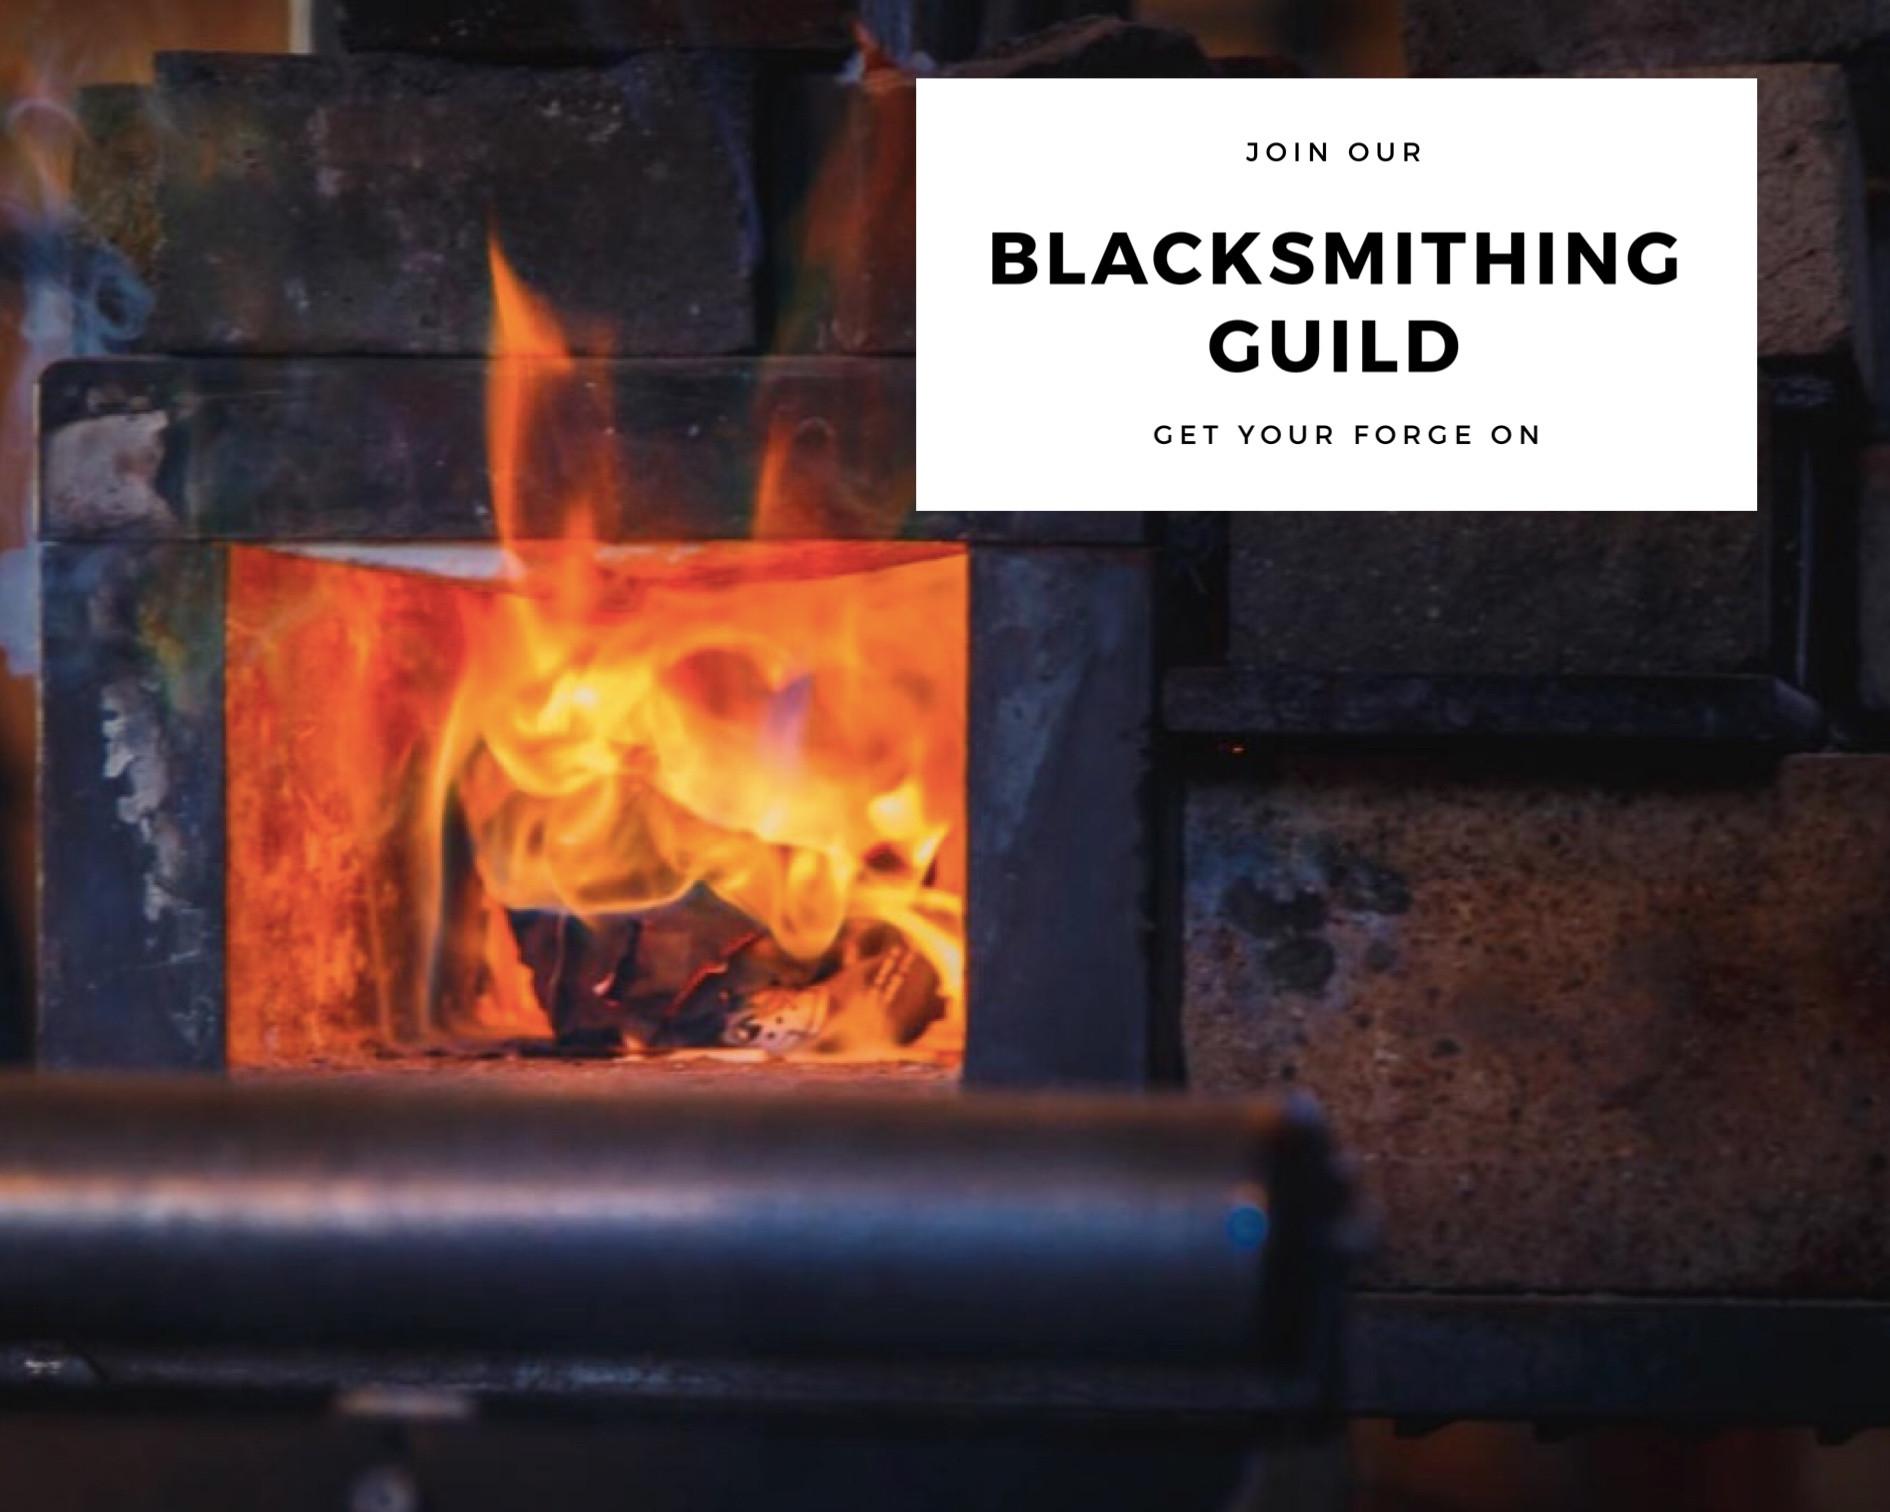 Blacksmithing Guild